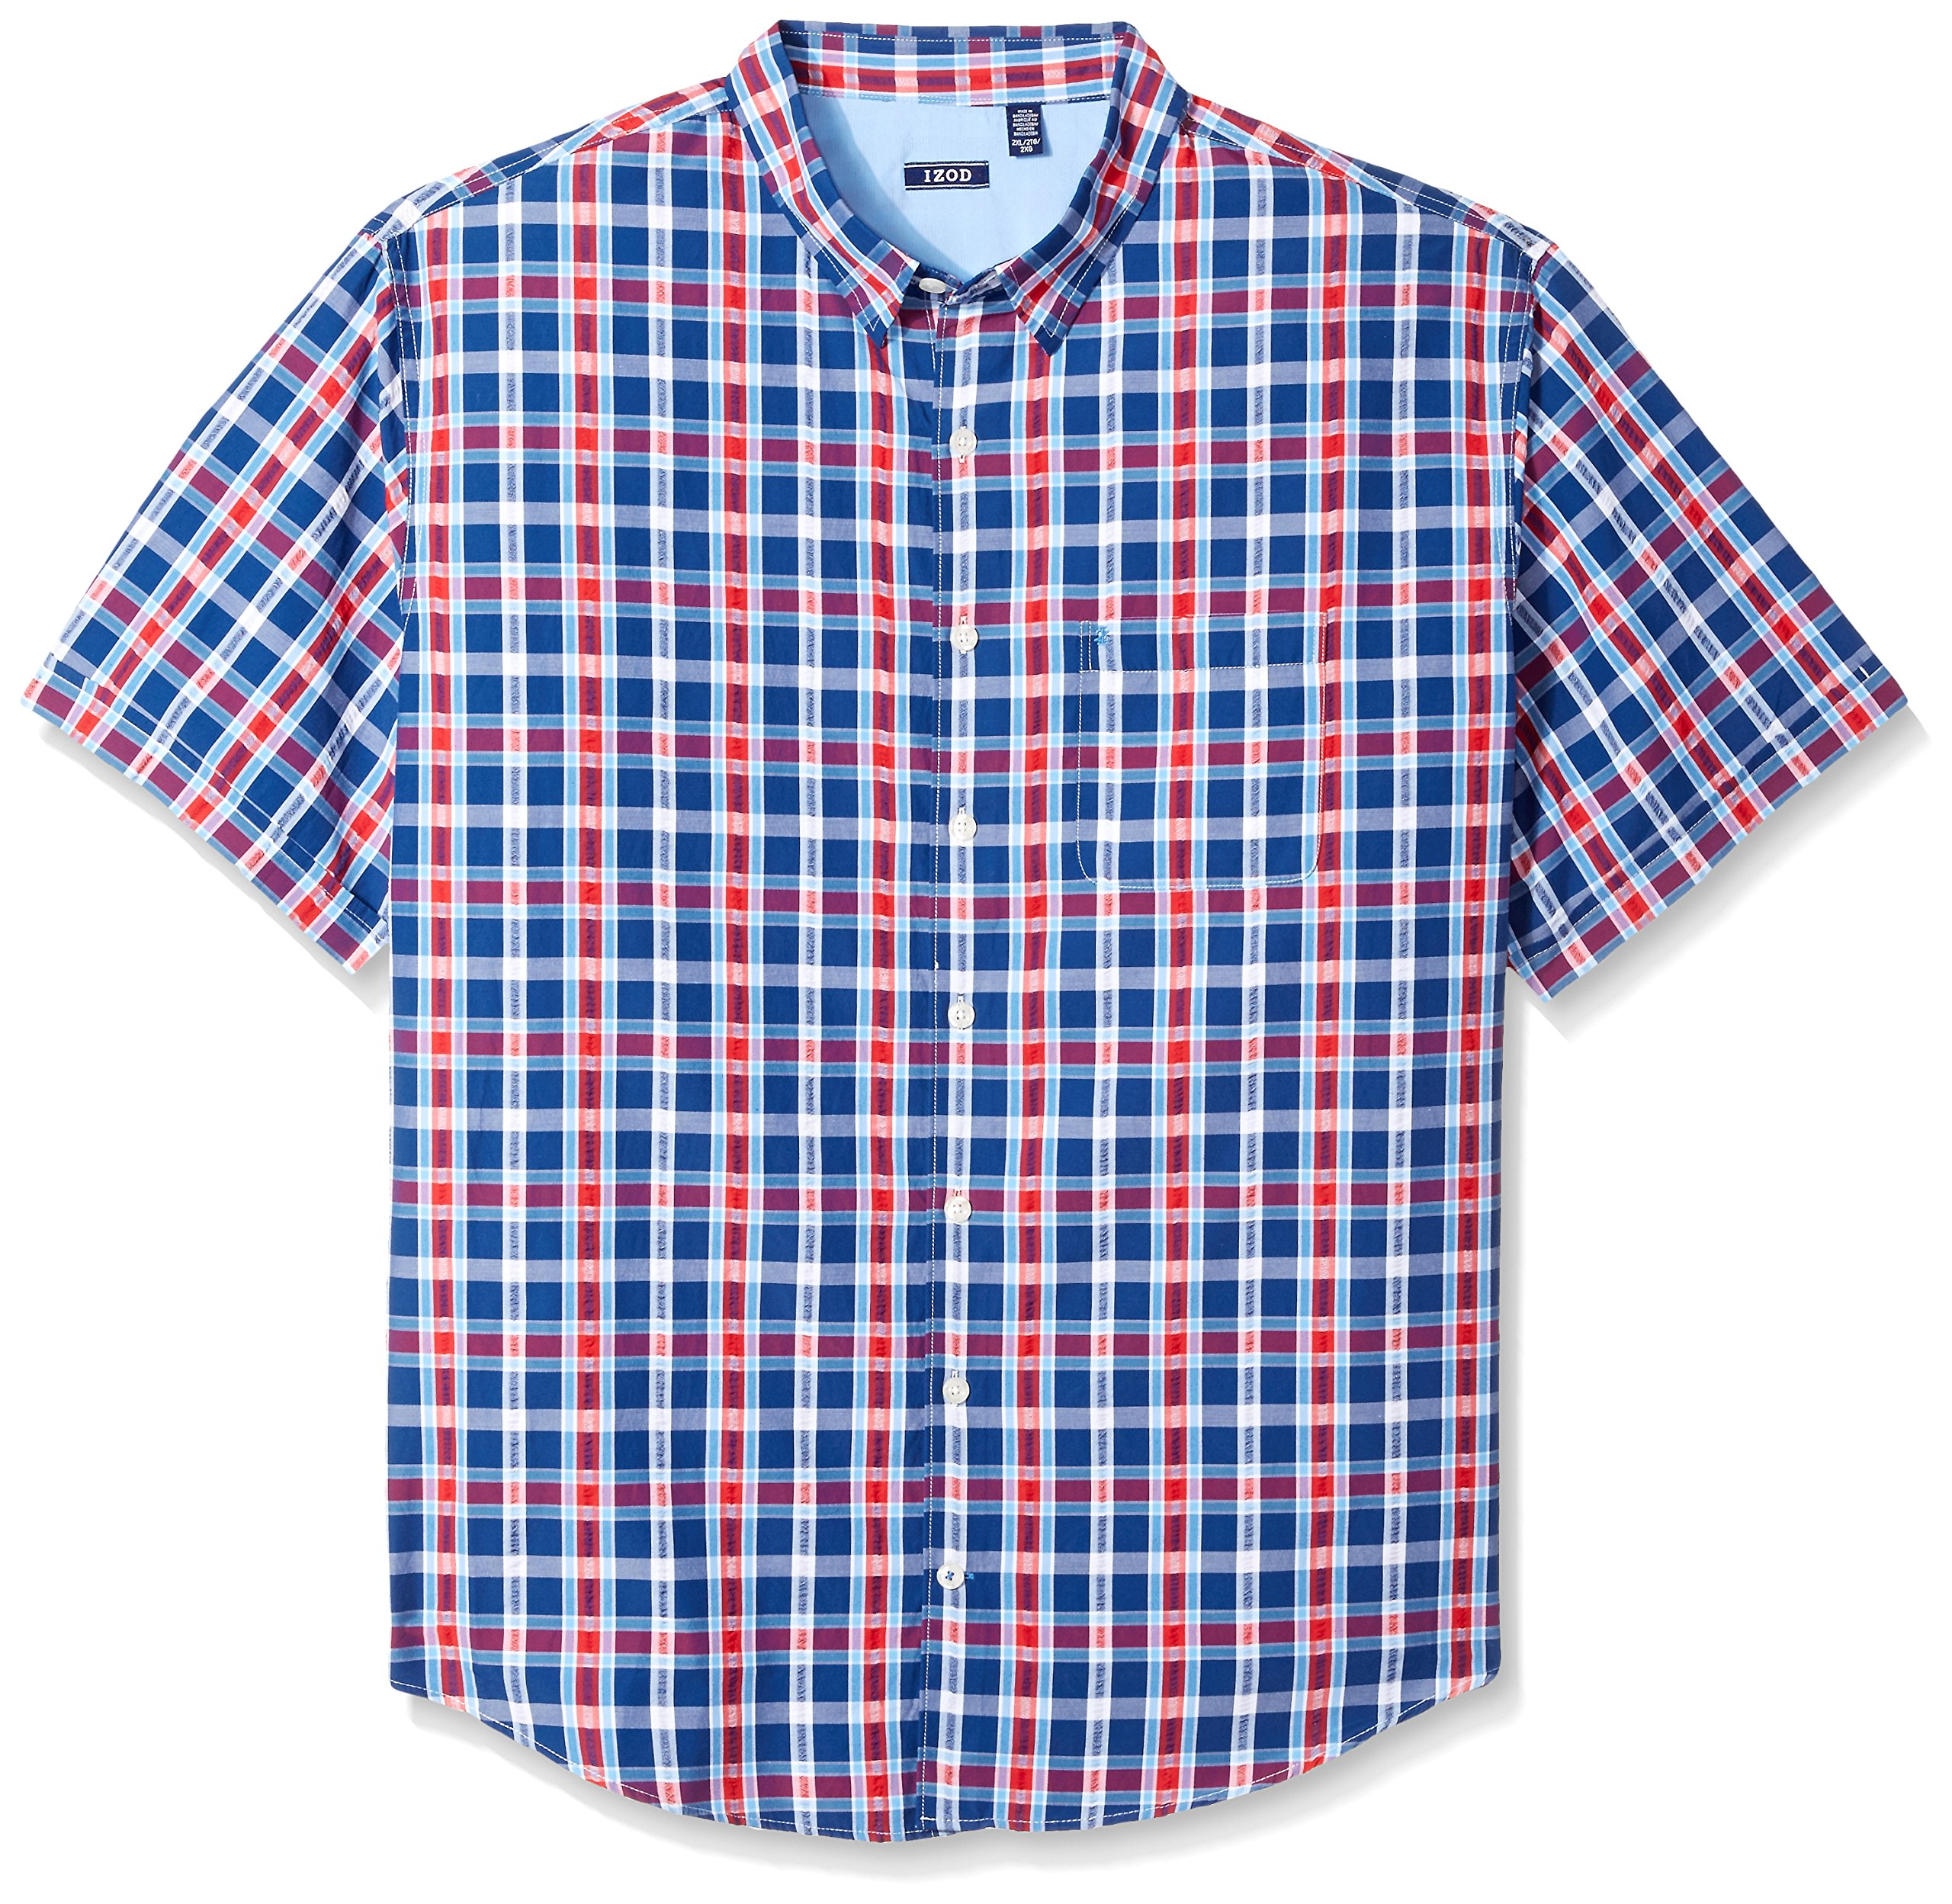 IZOD Men's Tall Short Sleeve Plaid Seersucker Shirt, Estate Blue, 4X-Large Big